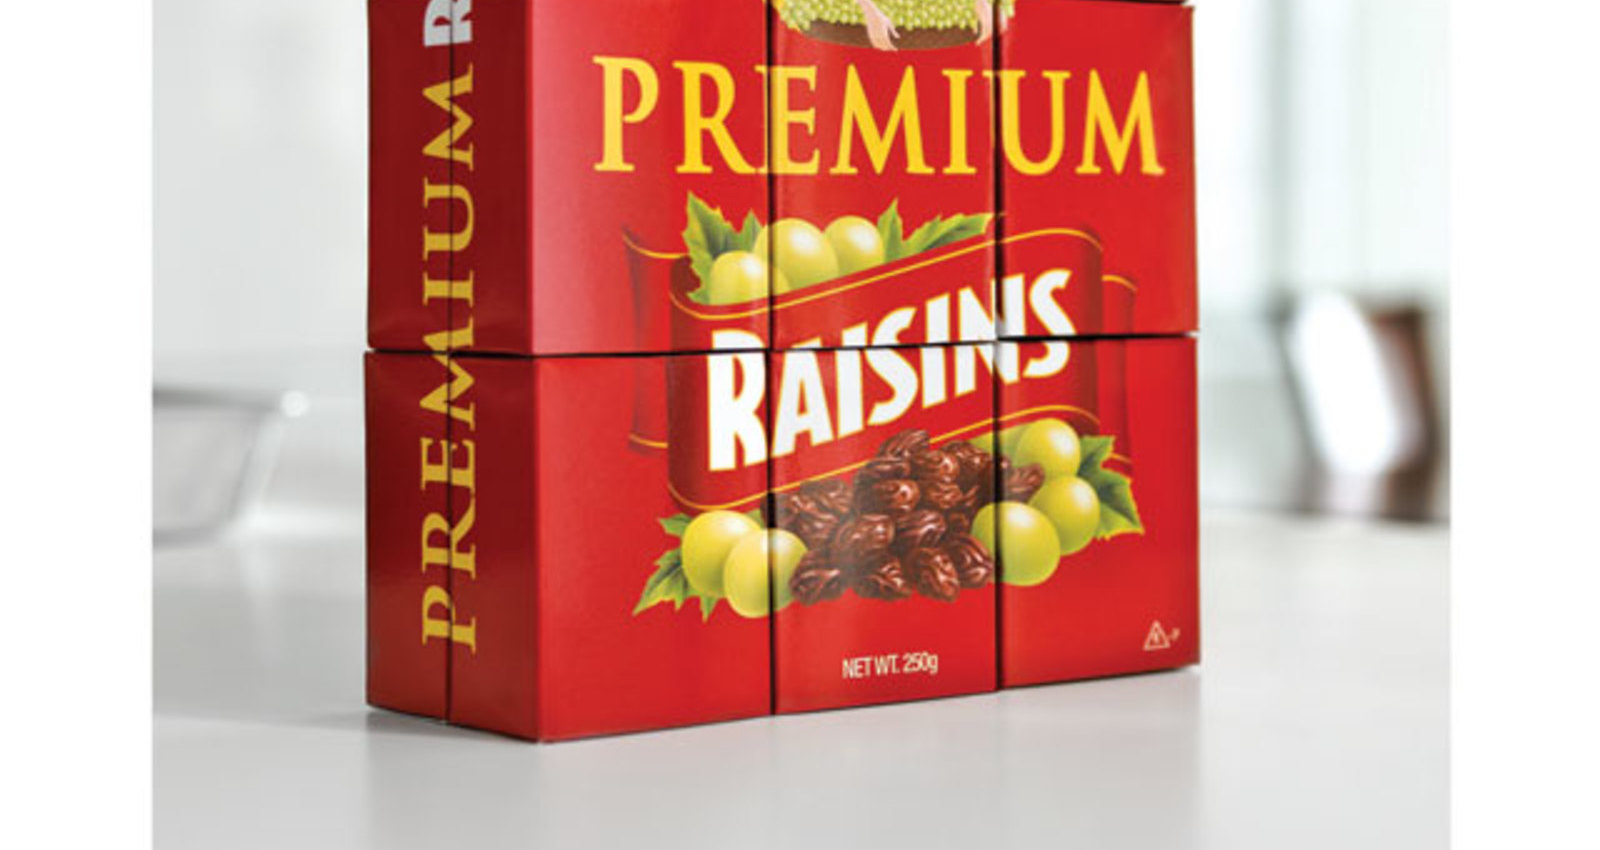 Freshlock : Cornflakes/Raisins/Crackers